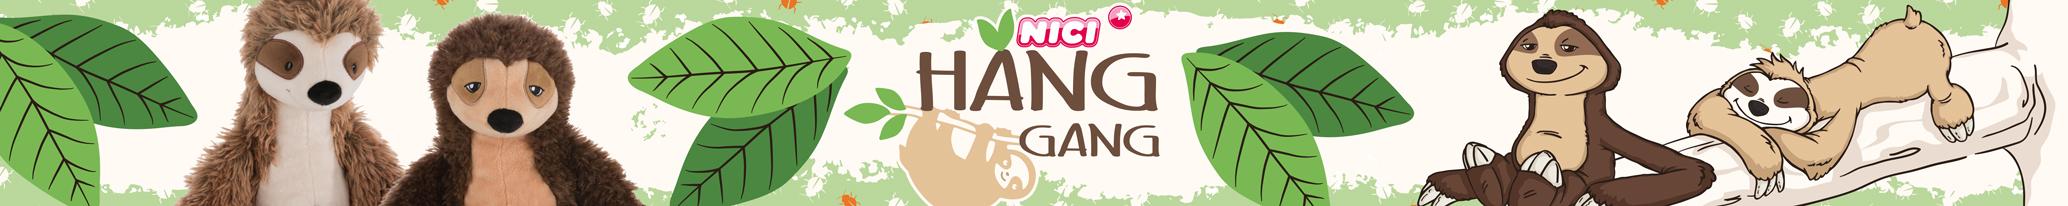 Hang Gang Faultiere